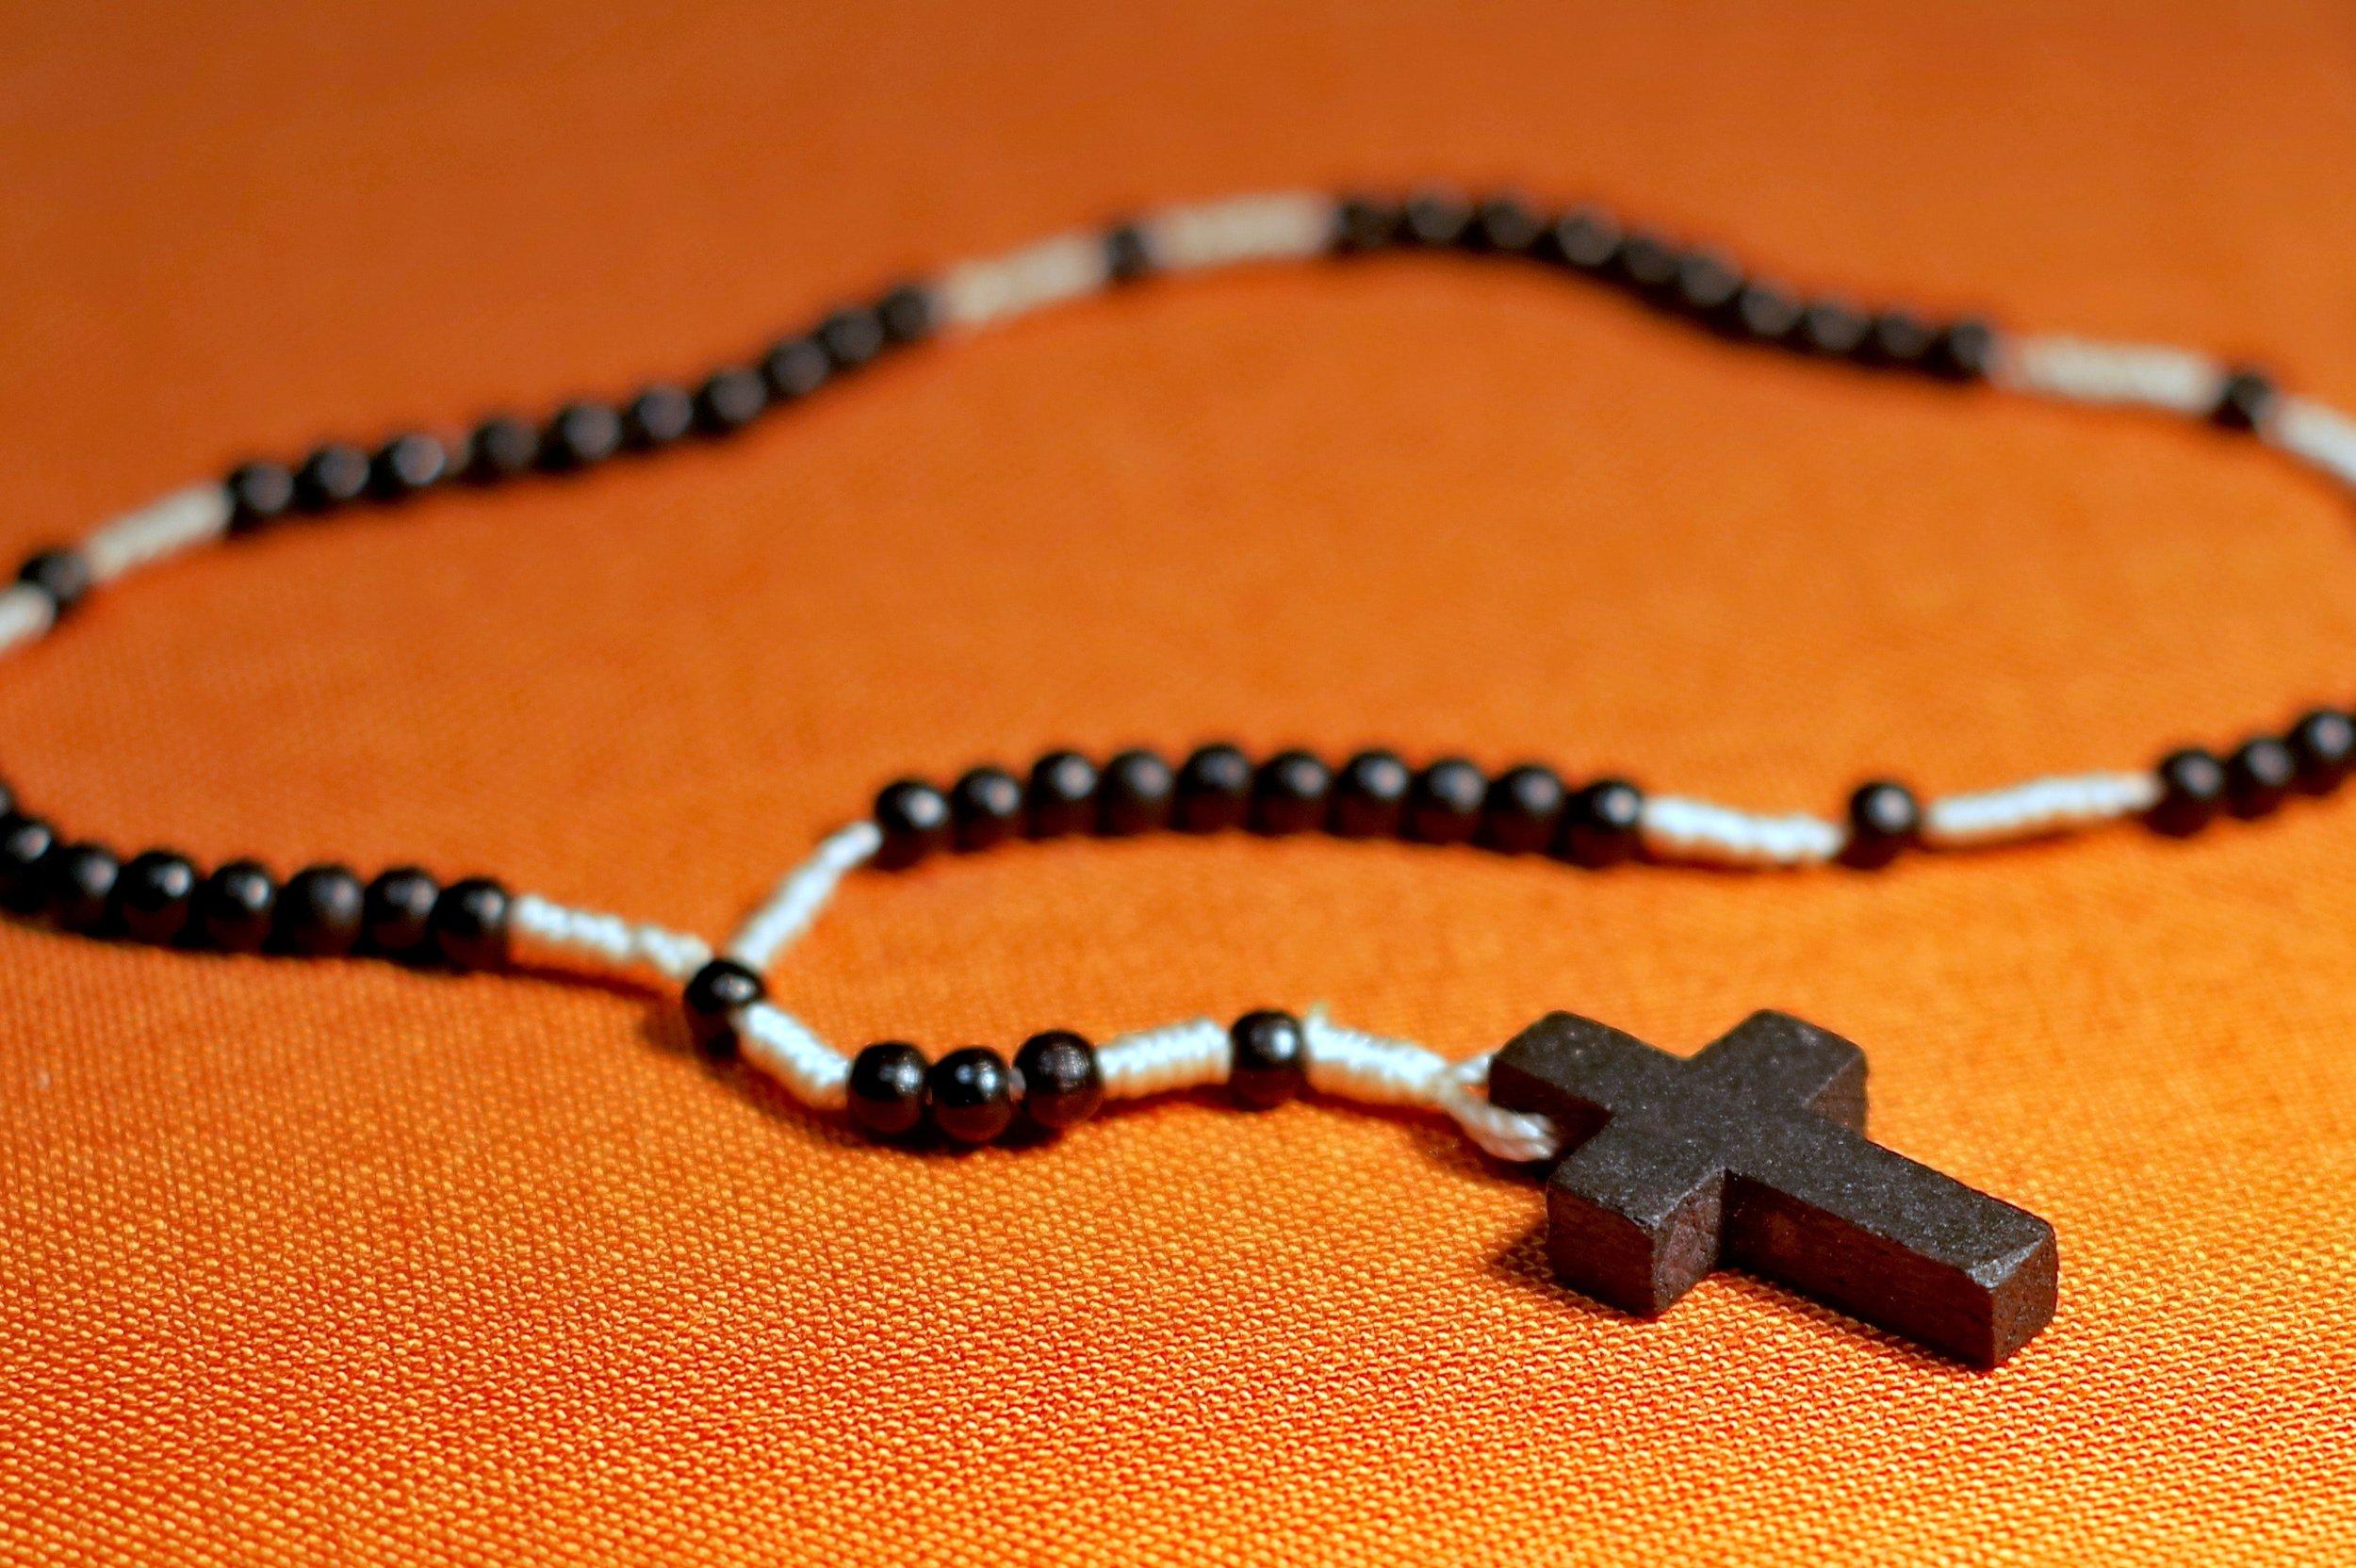 beads-catholicism-cross-236319.jpg